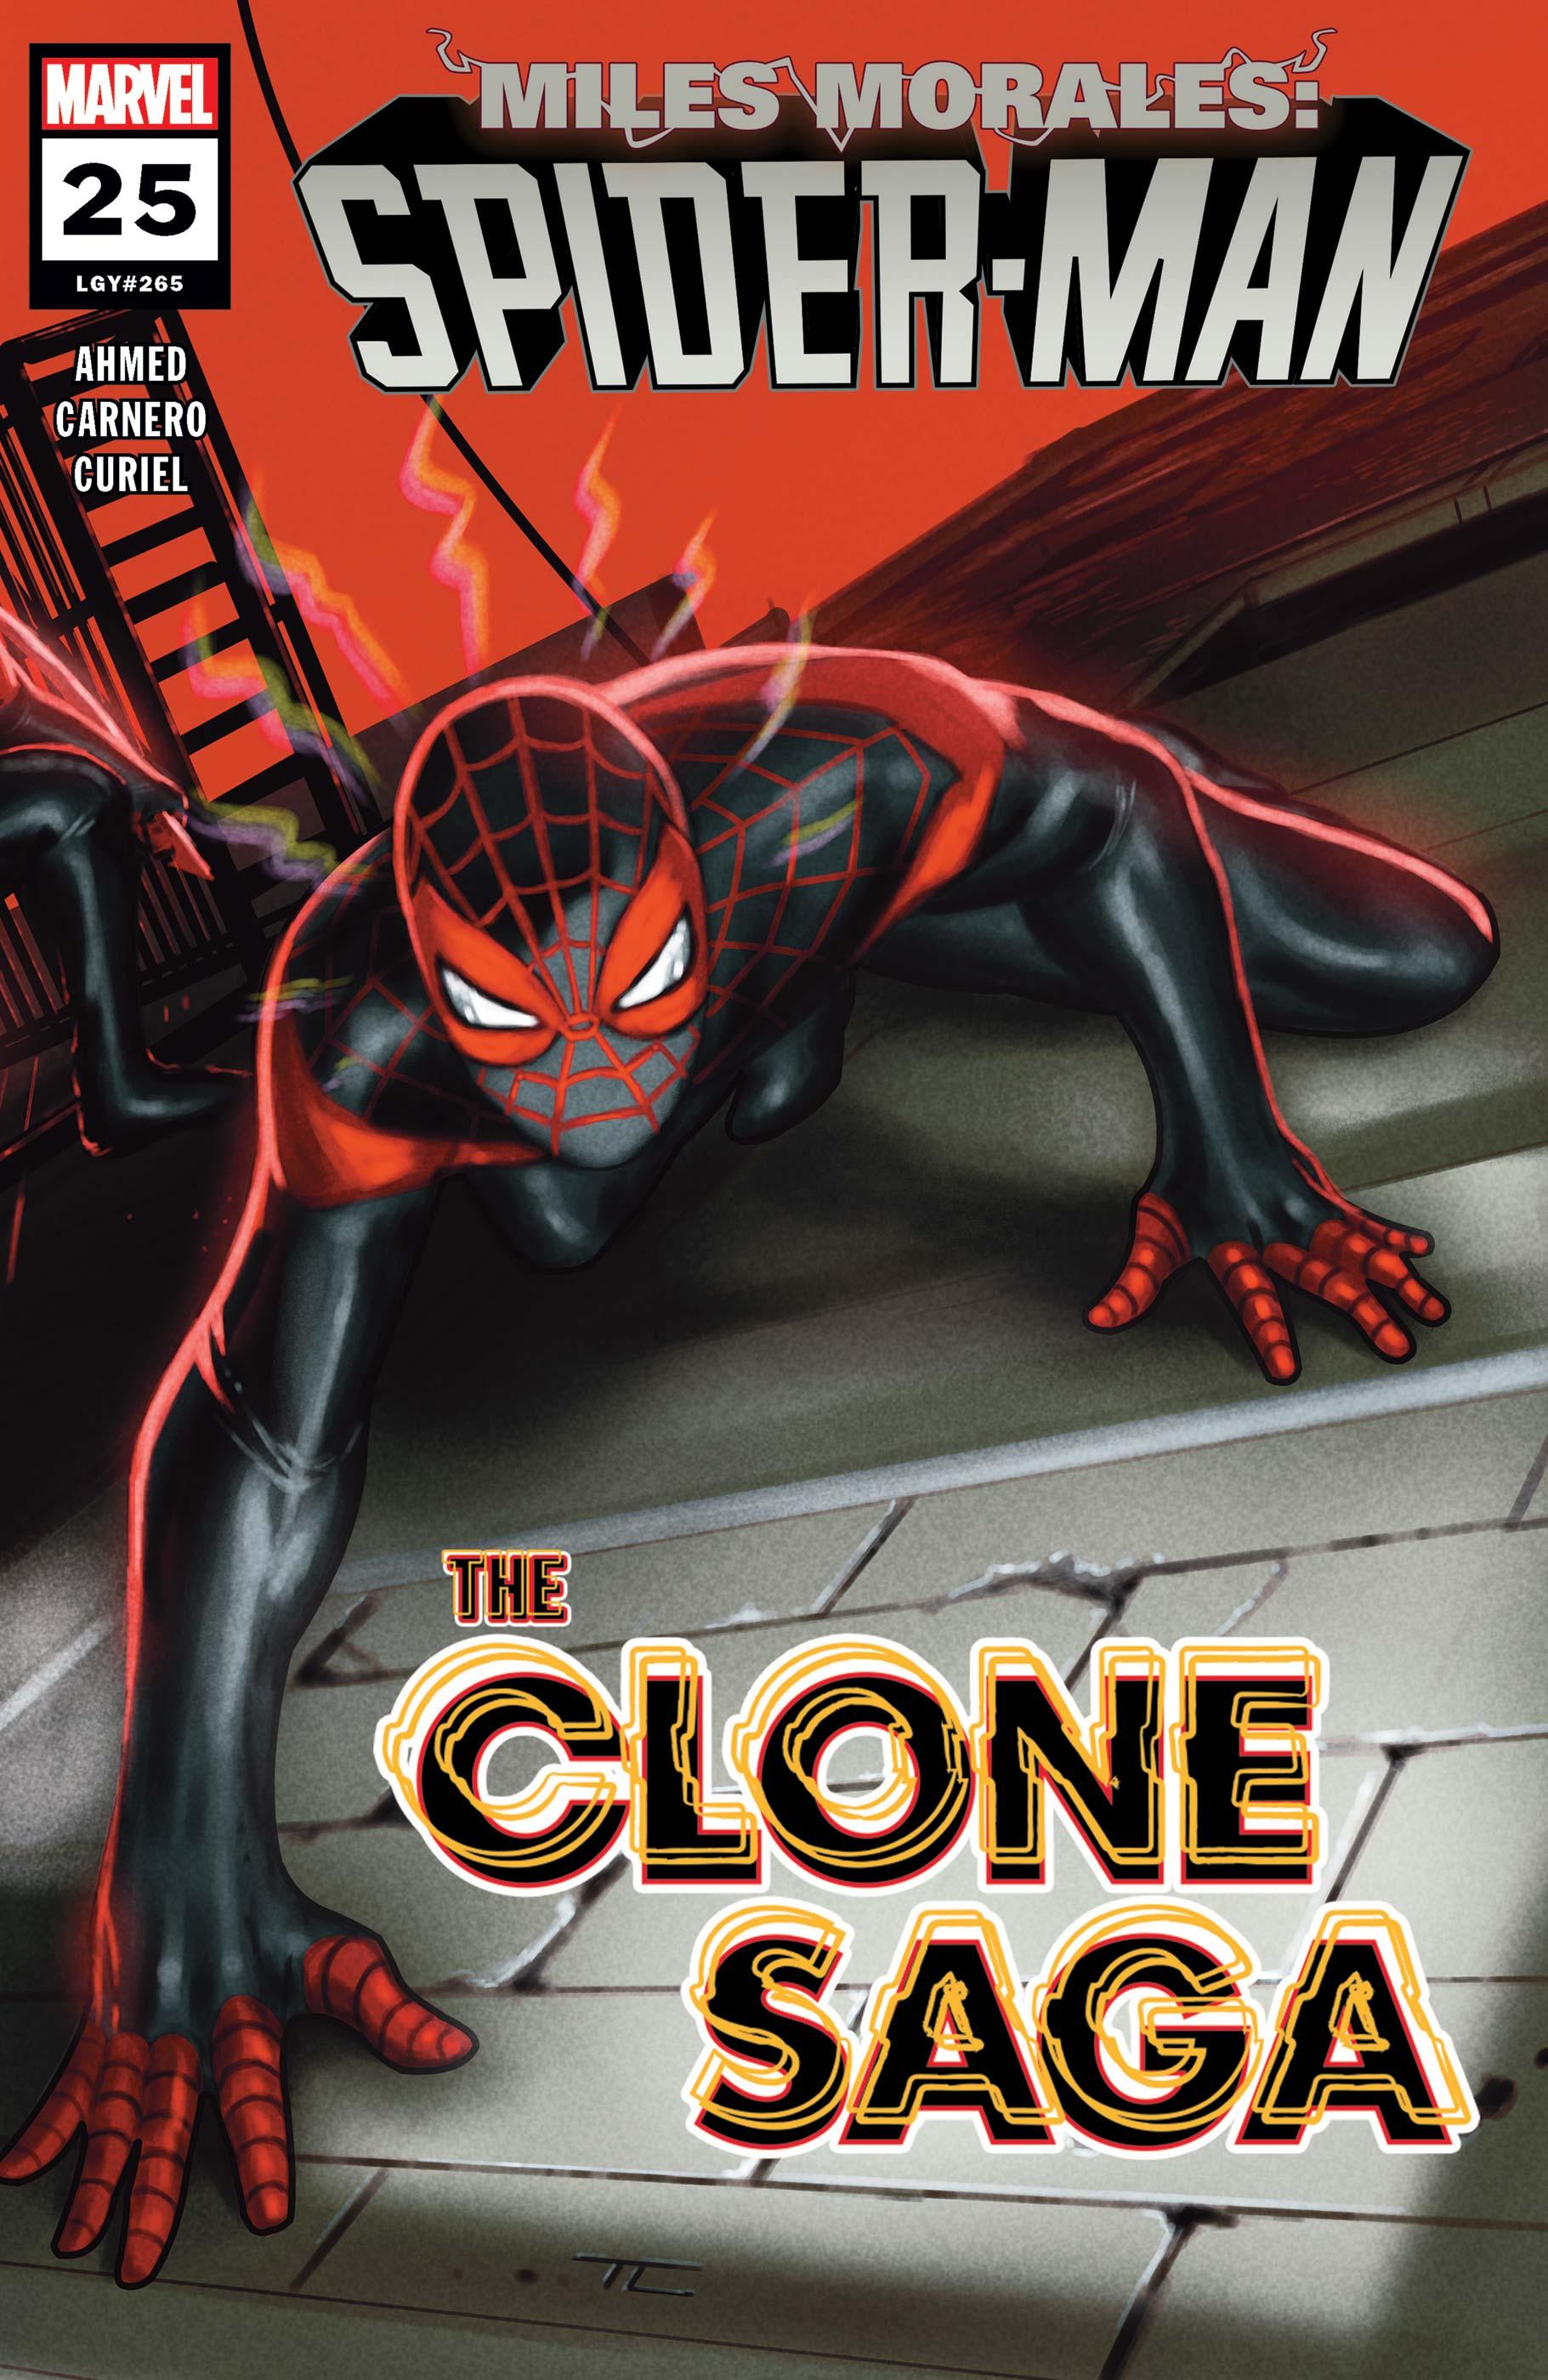 Miles Morales: Spider-Man (2018) #25